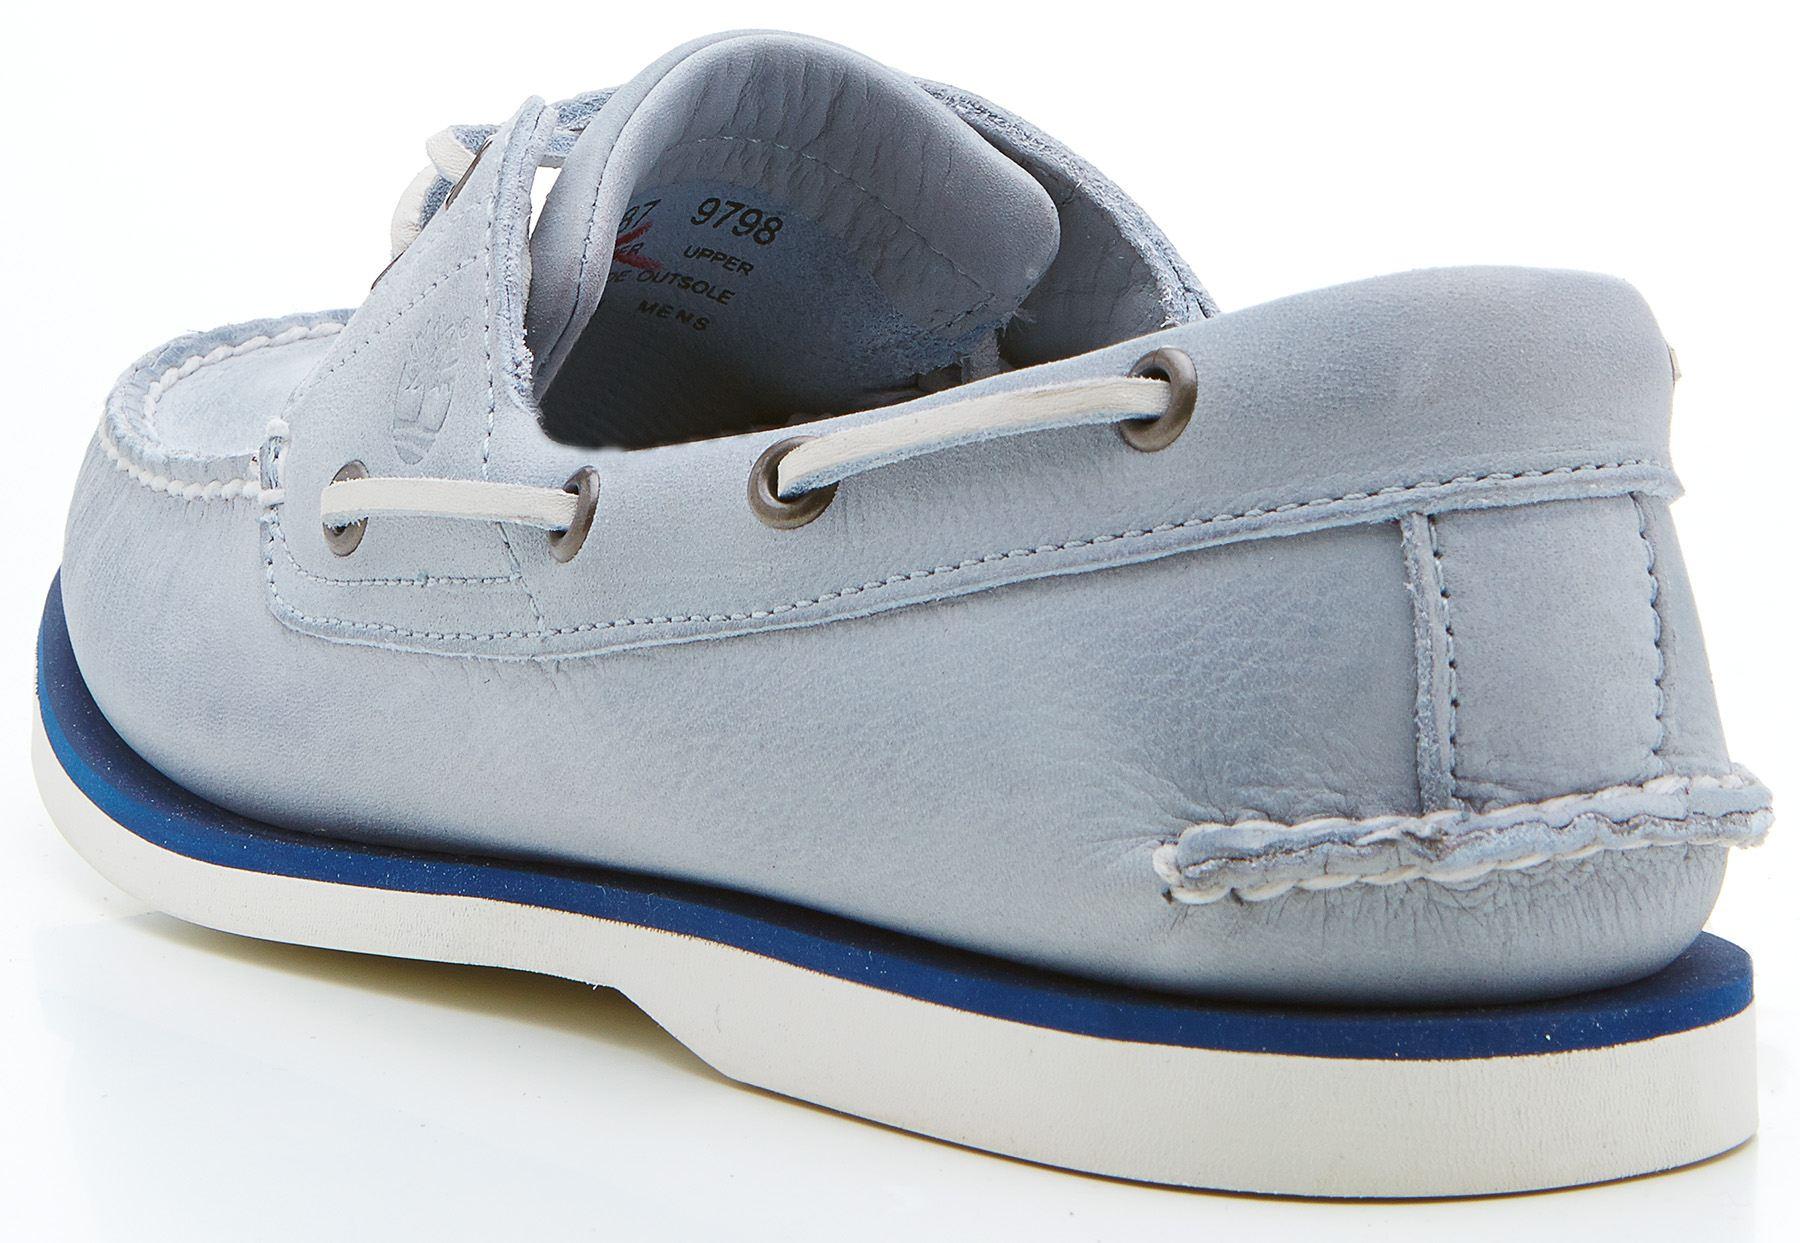 Timberland EK CLS 2-EYE boat shoes light blue 29587   eBay